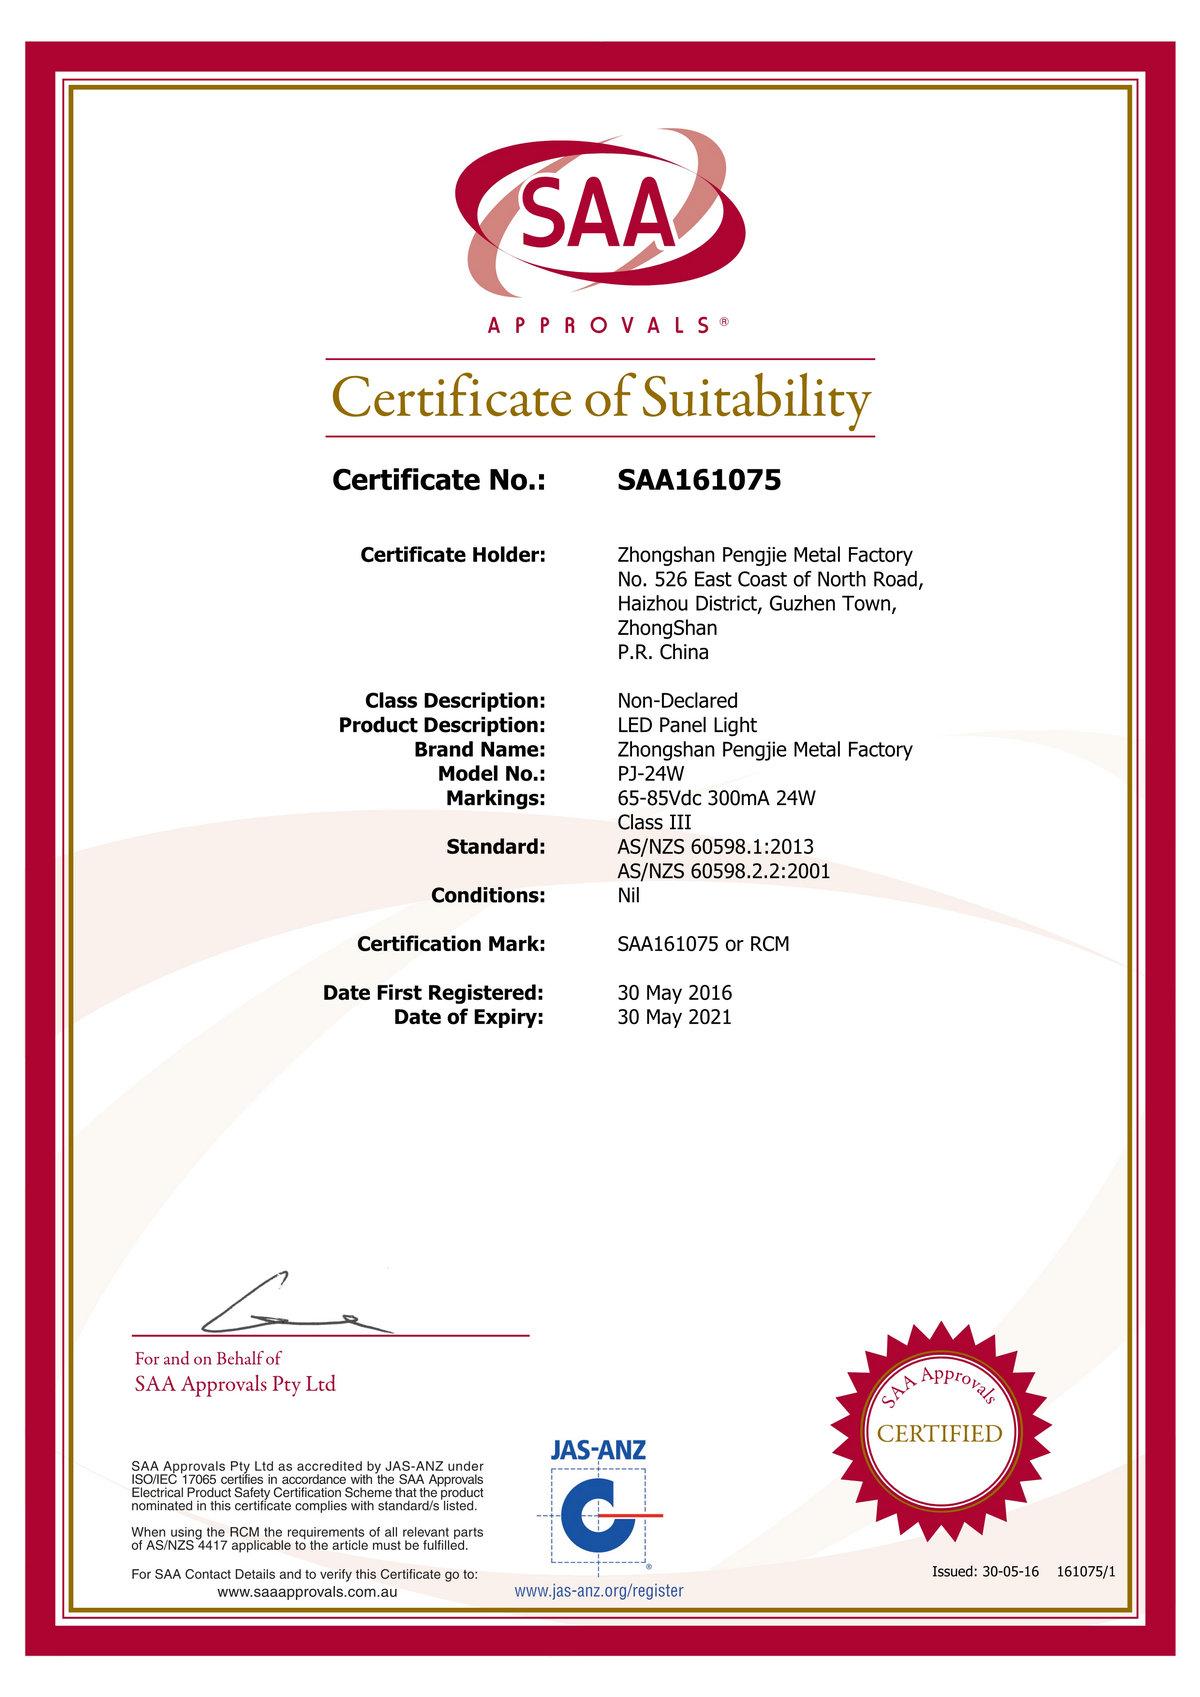 SAA Certificate ND 161075 (Panel Light)